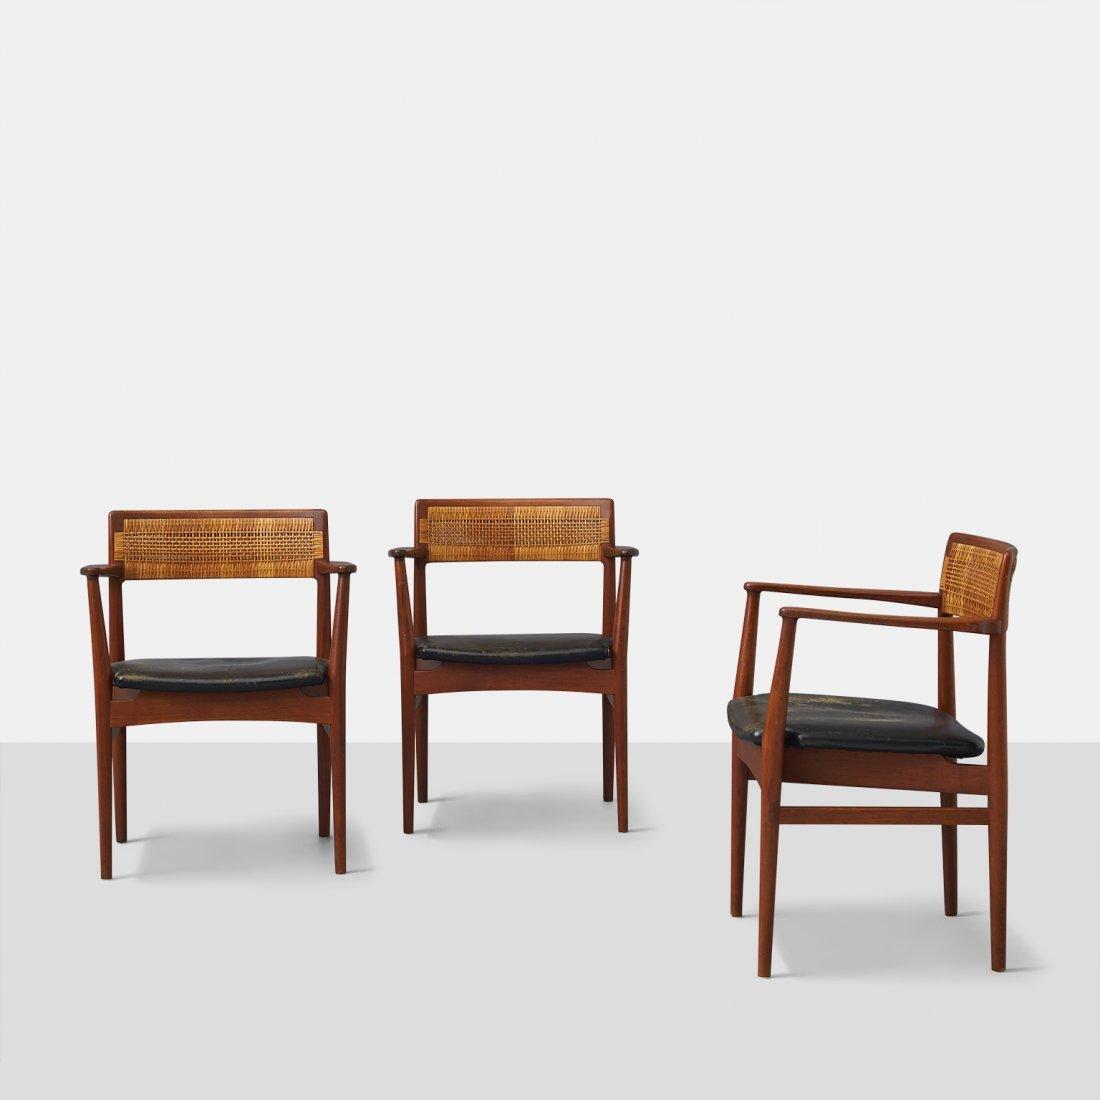 Eric Worts, Trio of W26 Armchairs